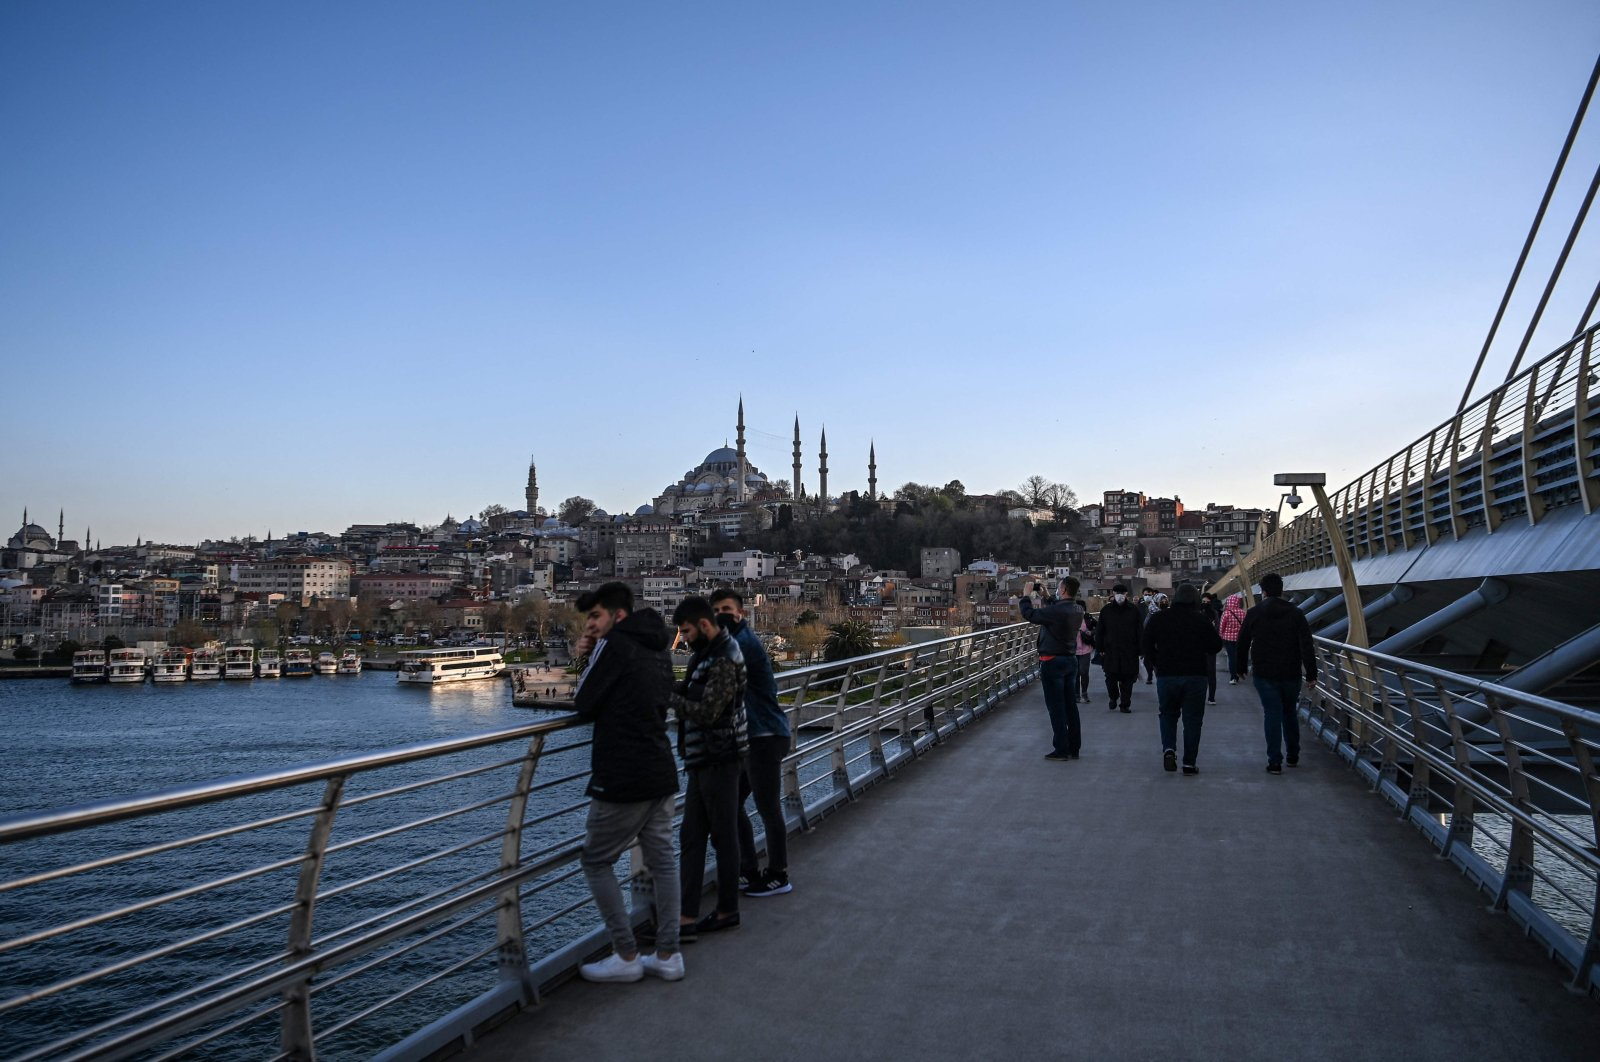 People walk on the metro bridge, with the Süleymaniye Mosque in the background, in the Karakoy neighborhood of Istanbul, Turkey, April 7, 2021. (AFP Photo)